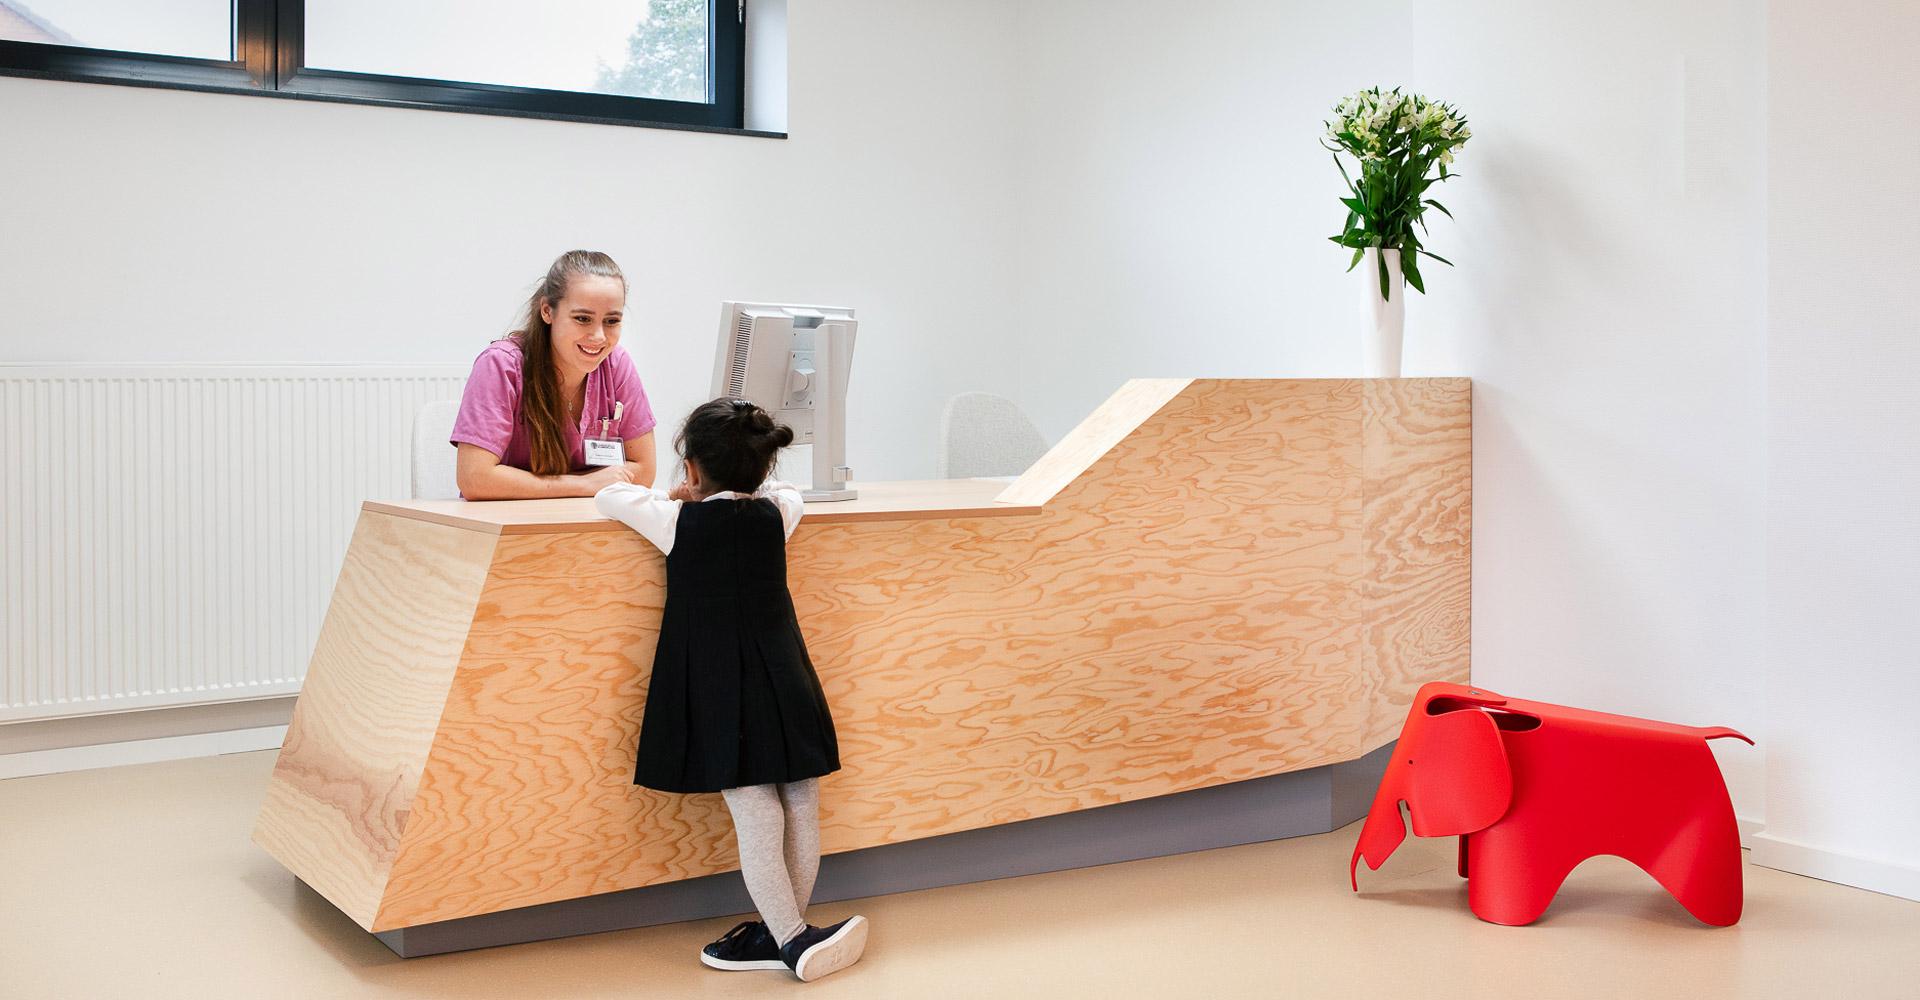 baukind Kinderzahnarztpraxis Kinderlieb Kinderrezeption